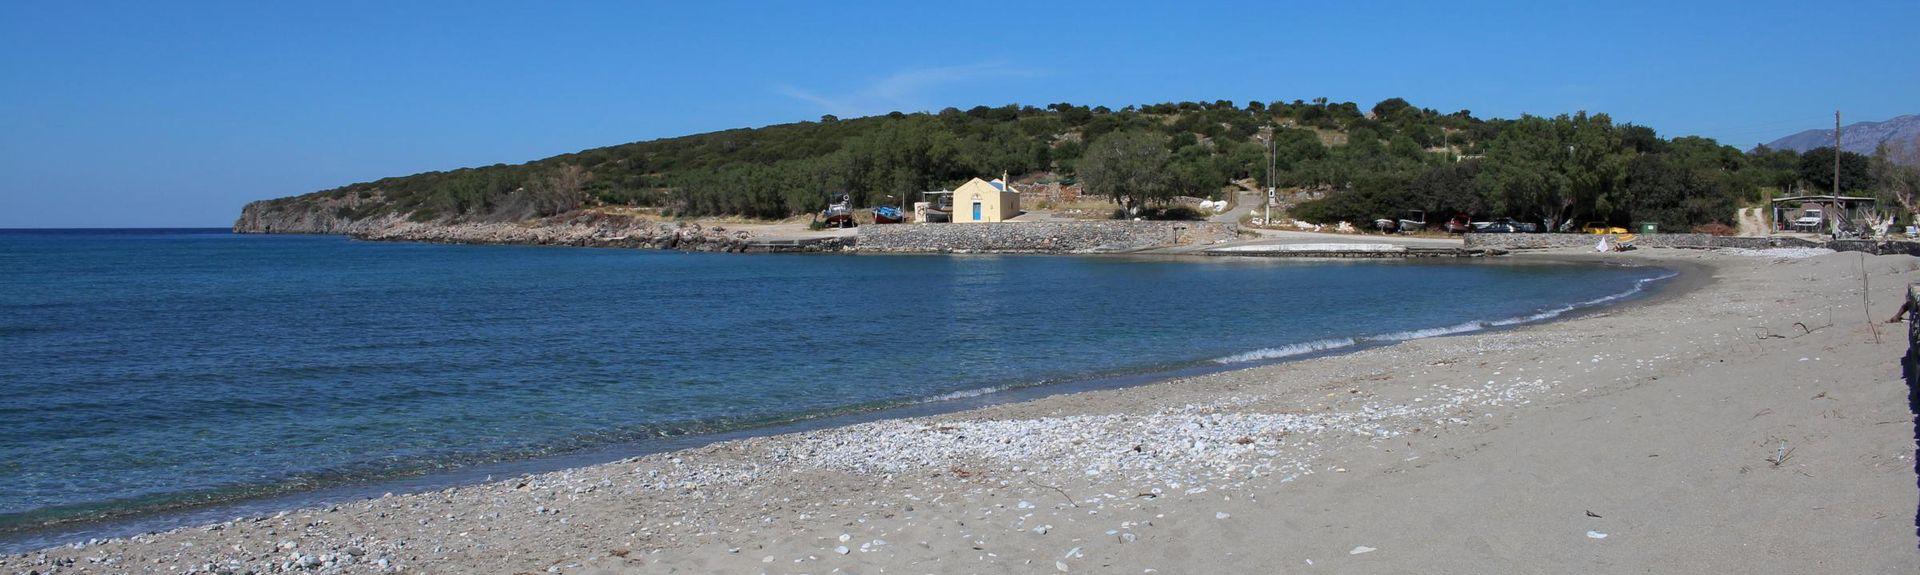 Vathi, Greece